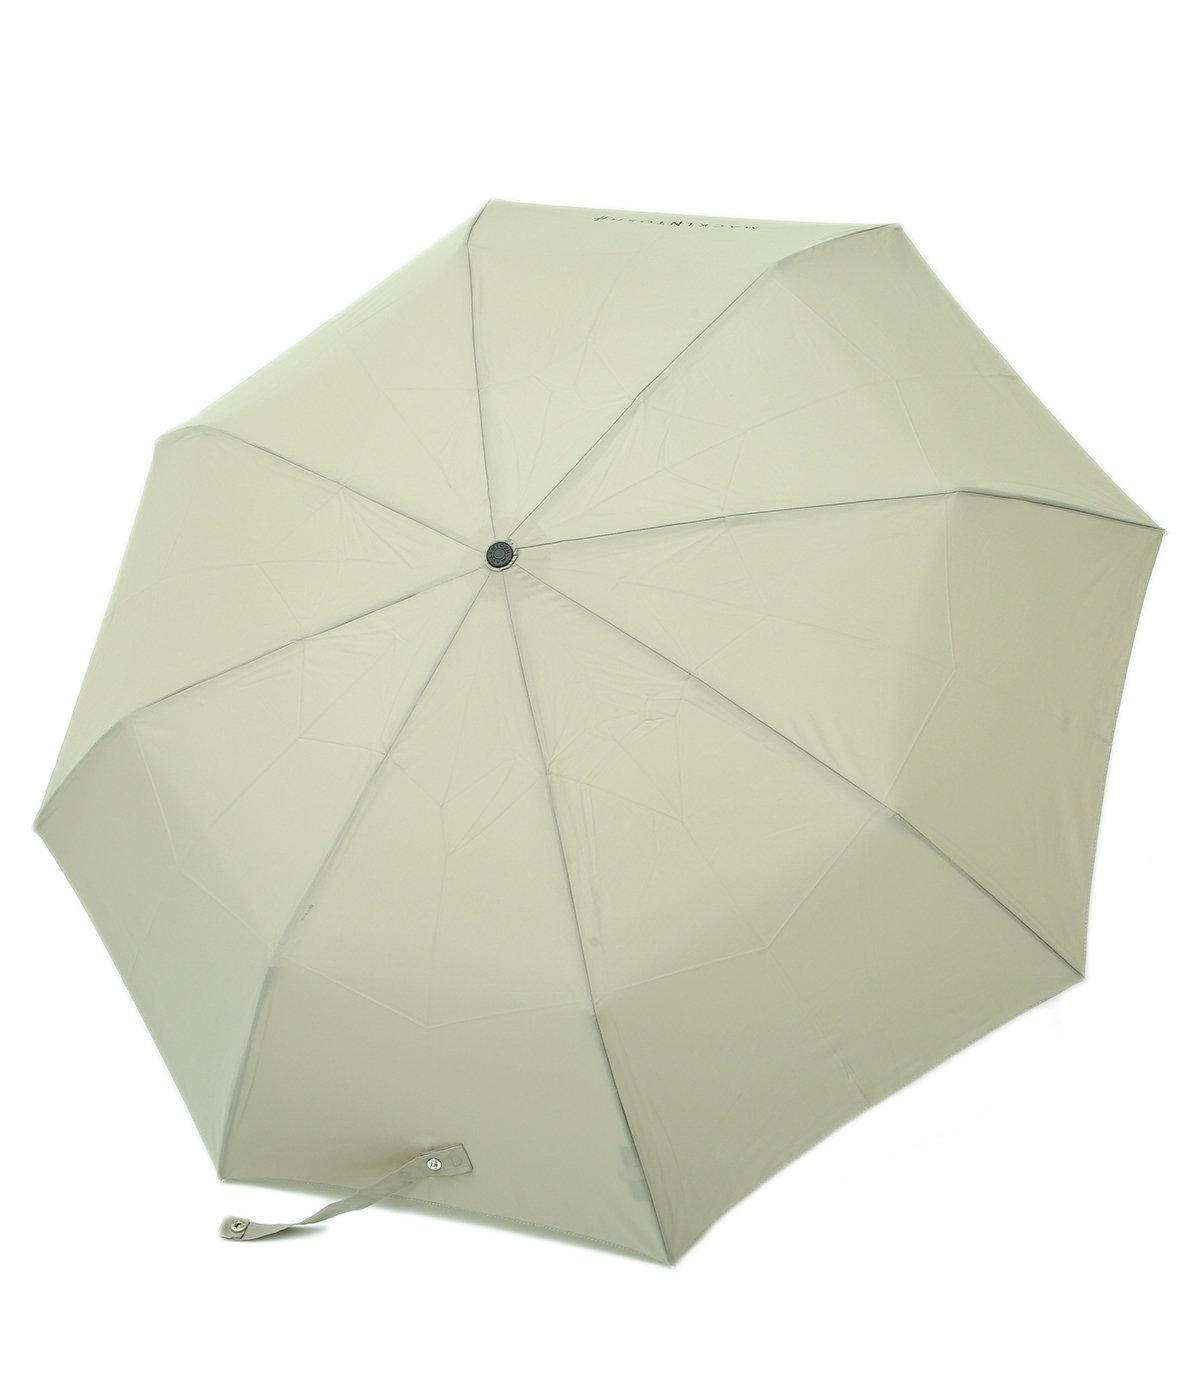 AYAR UMBRELLA / 折り畳み傘